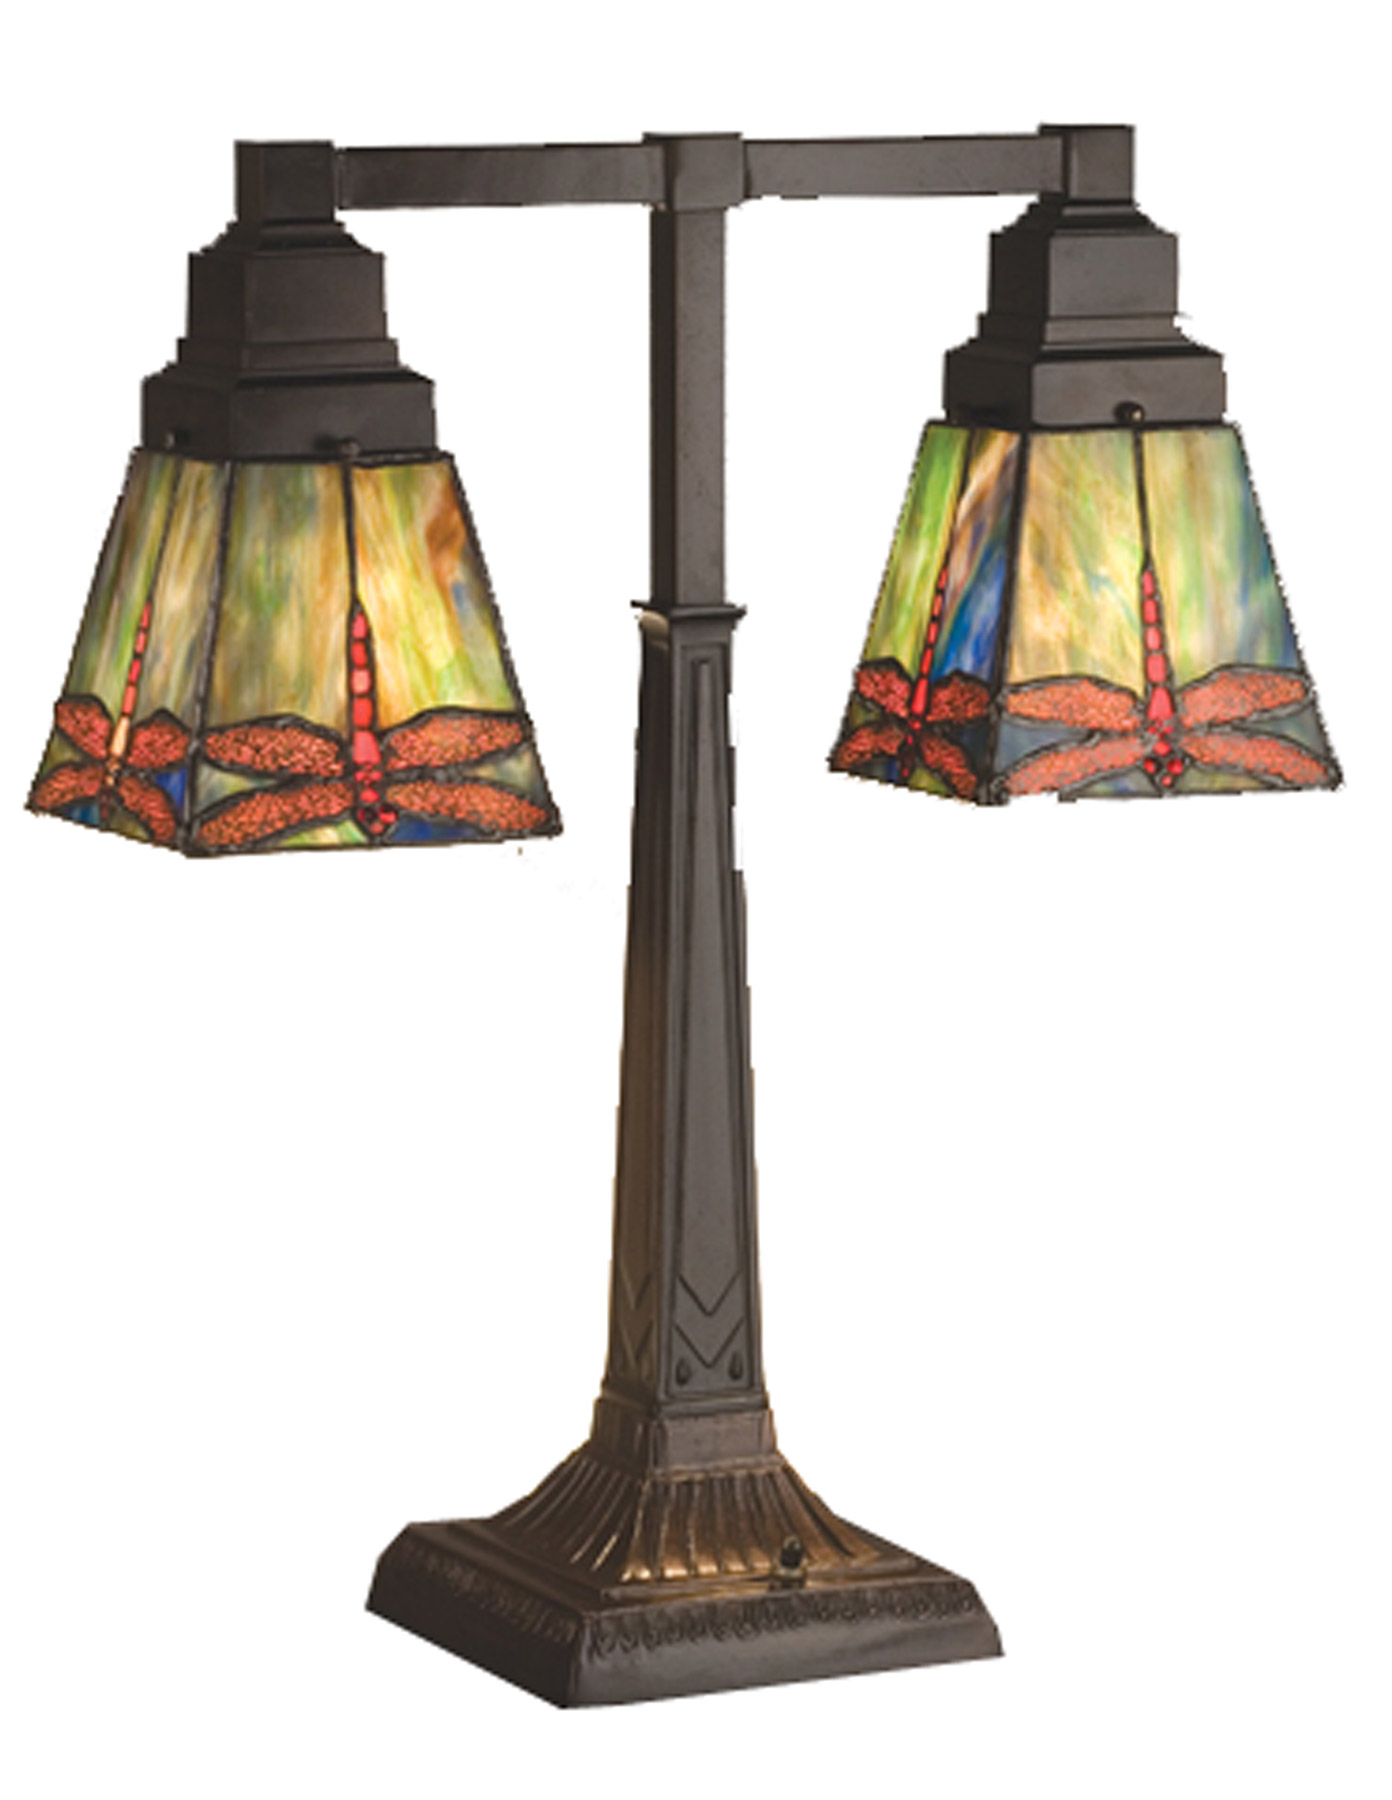 home lamps table lamps desk lamps meyda 48203. Black Bedroom Furniture Sets. Home Design Ideas